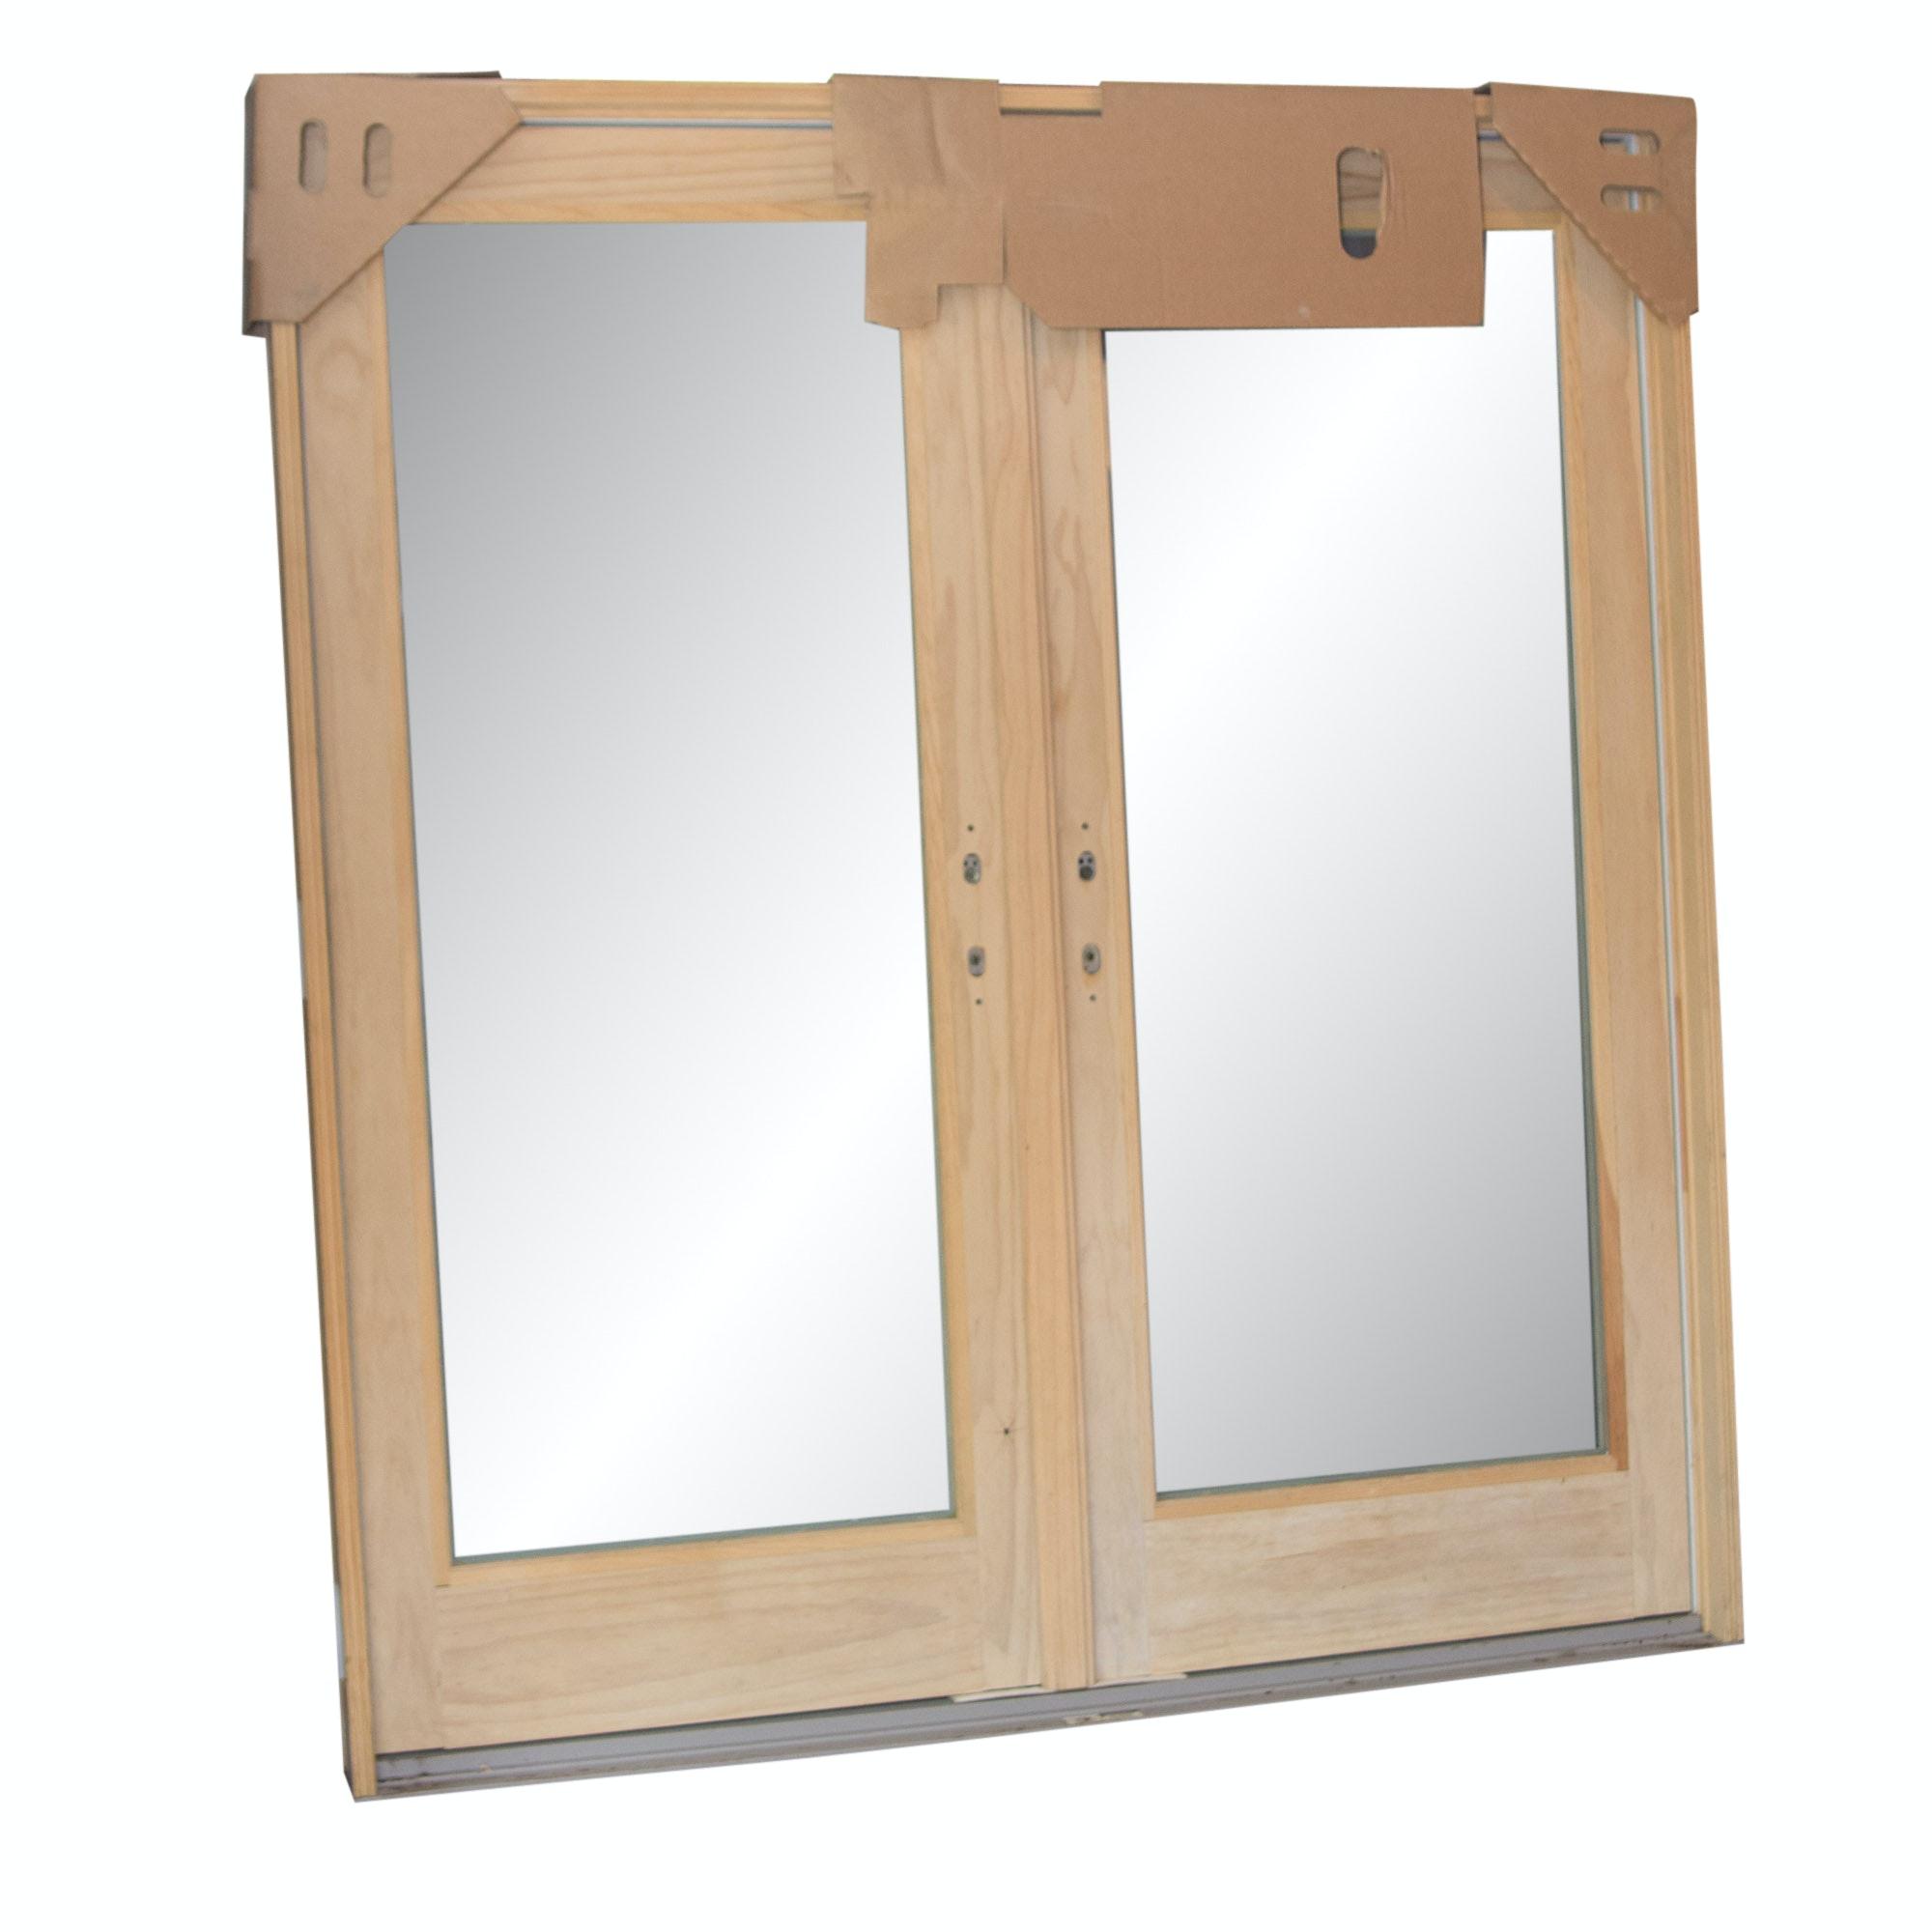 Two Andersen Frenchwood Outswing Doors